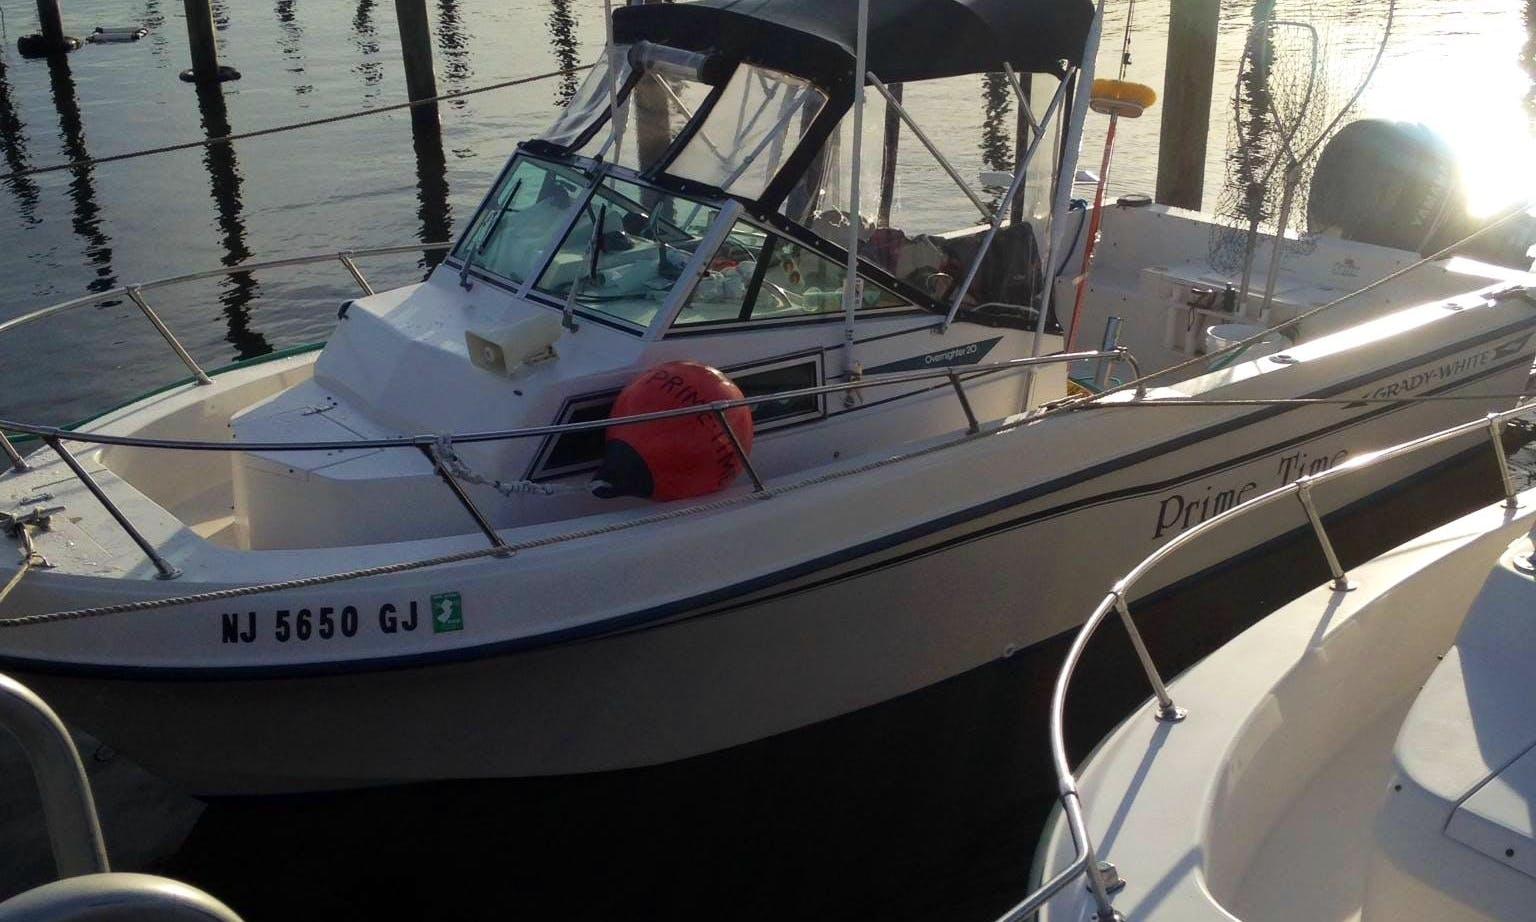 20ft Grady White Cuddy Cabin/Walk Around Boat Fishing Charter in Highlands, New Jersey